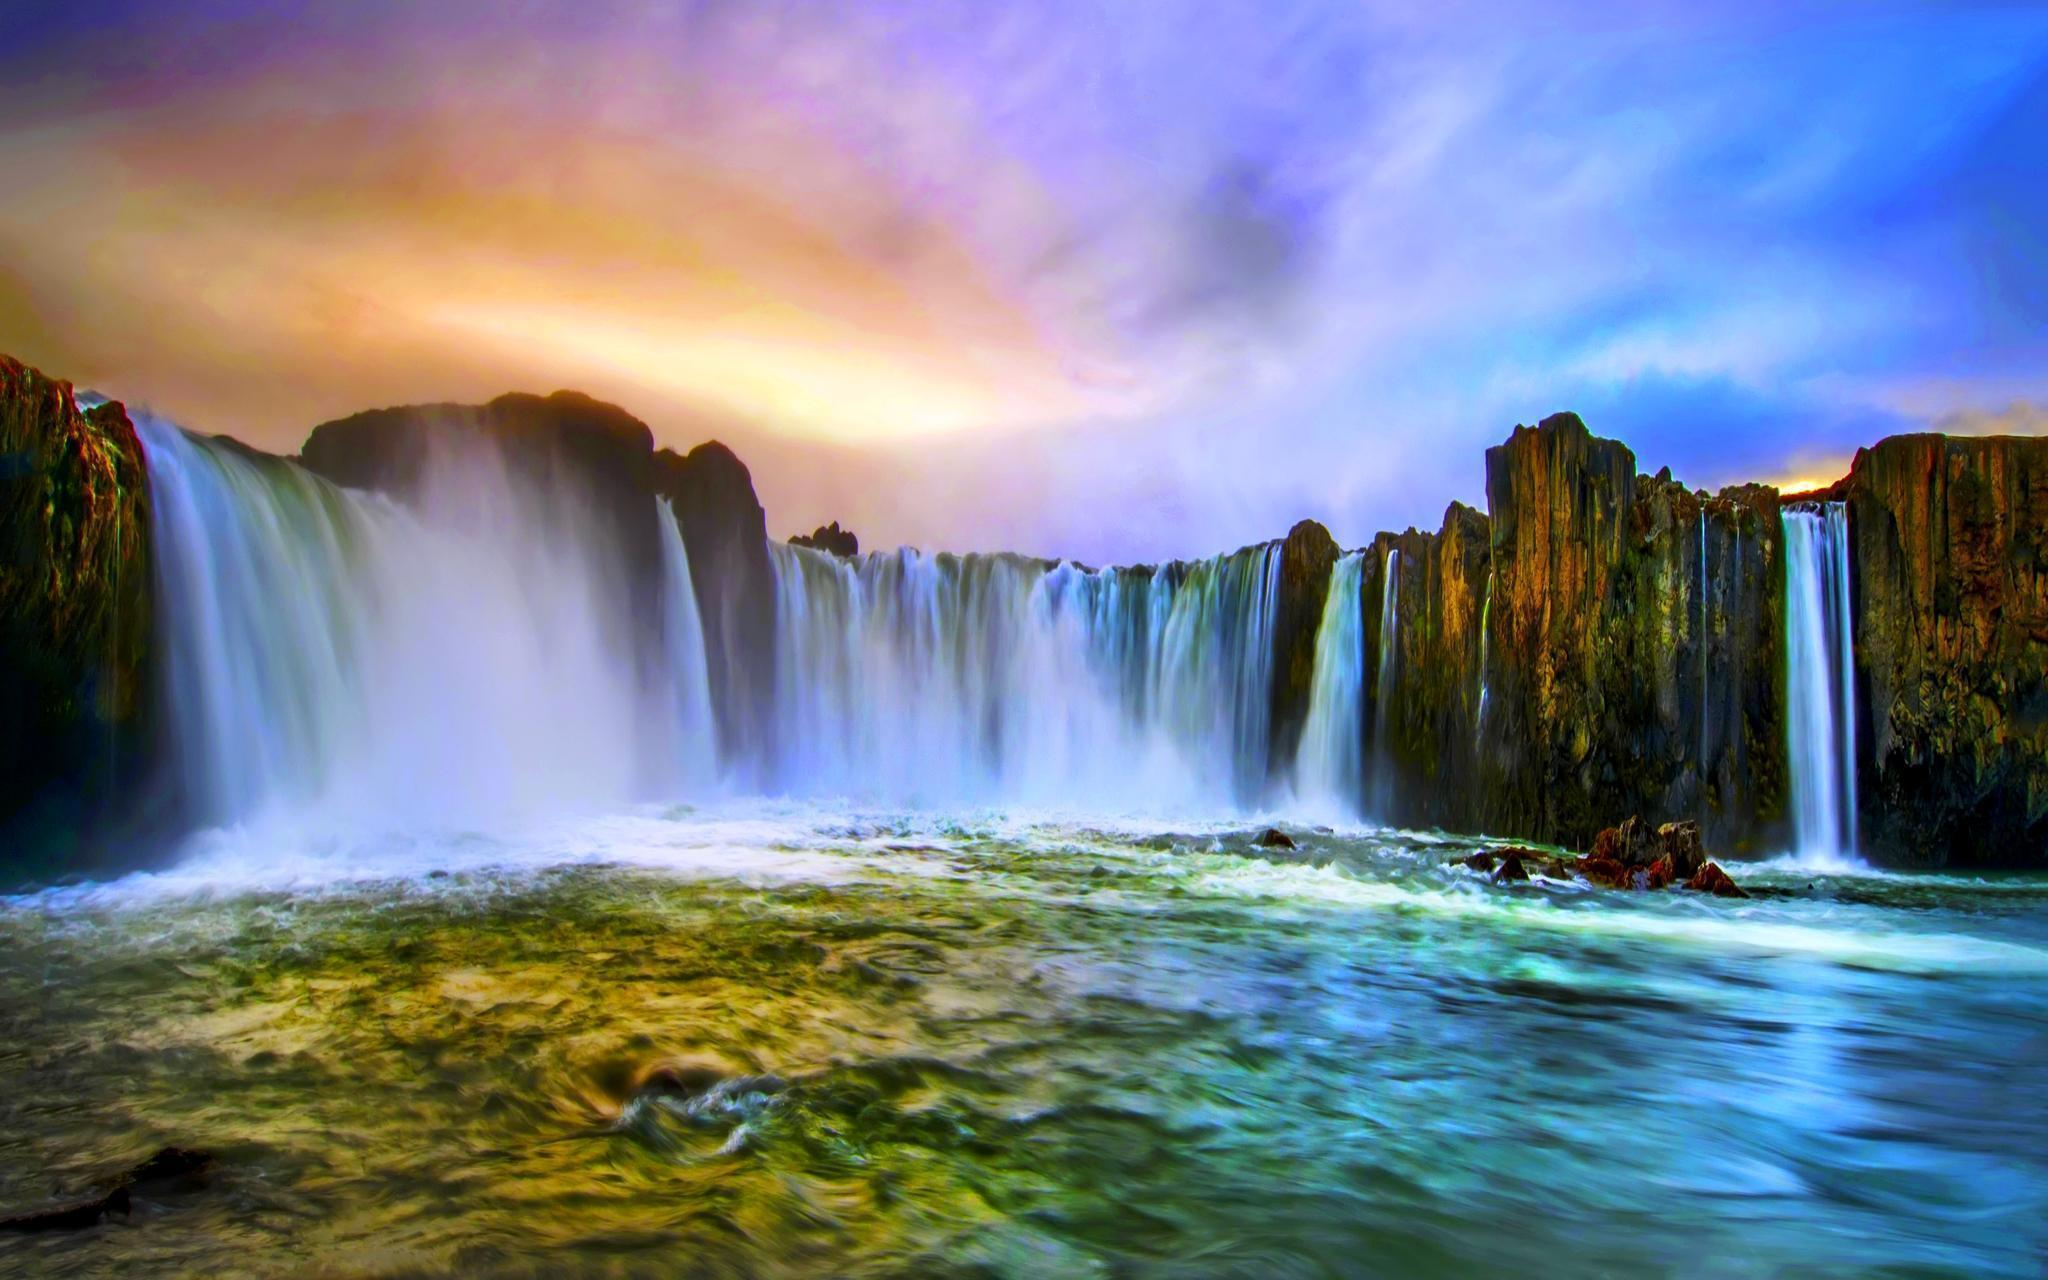 Water Falls Wallpapers